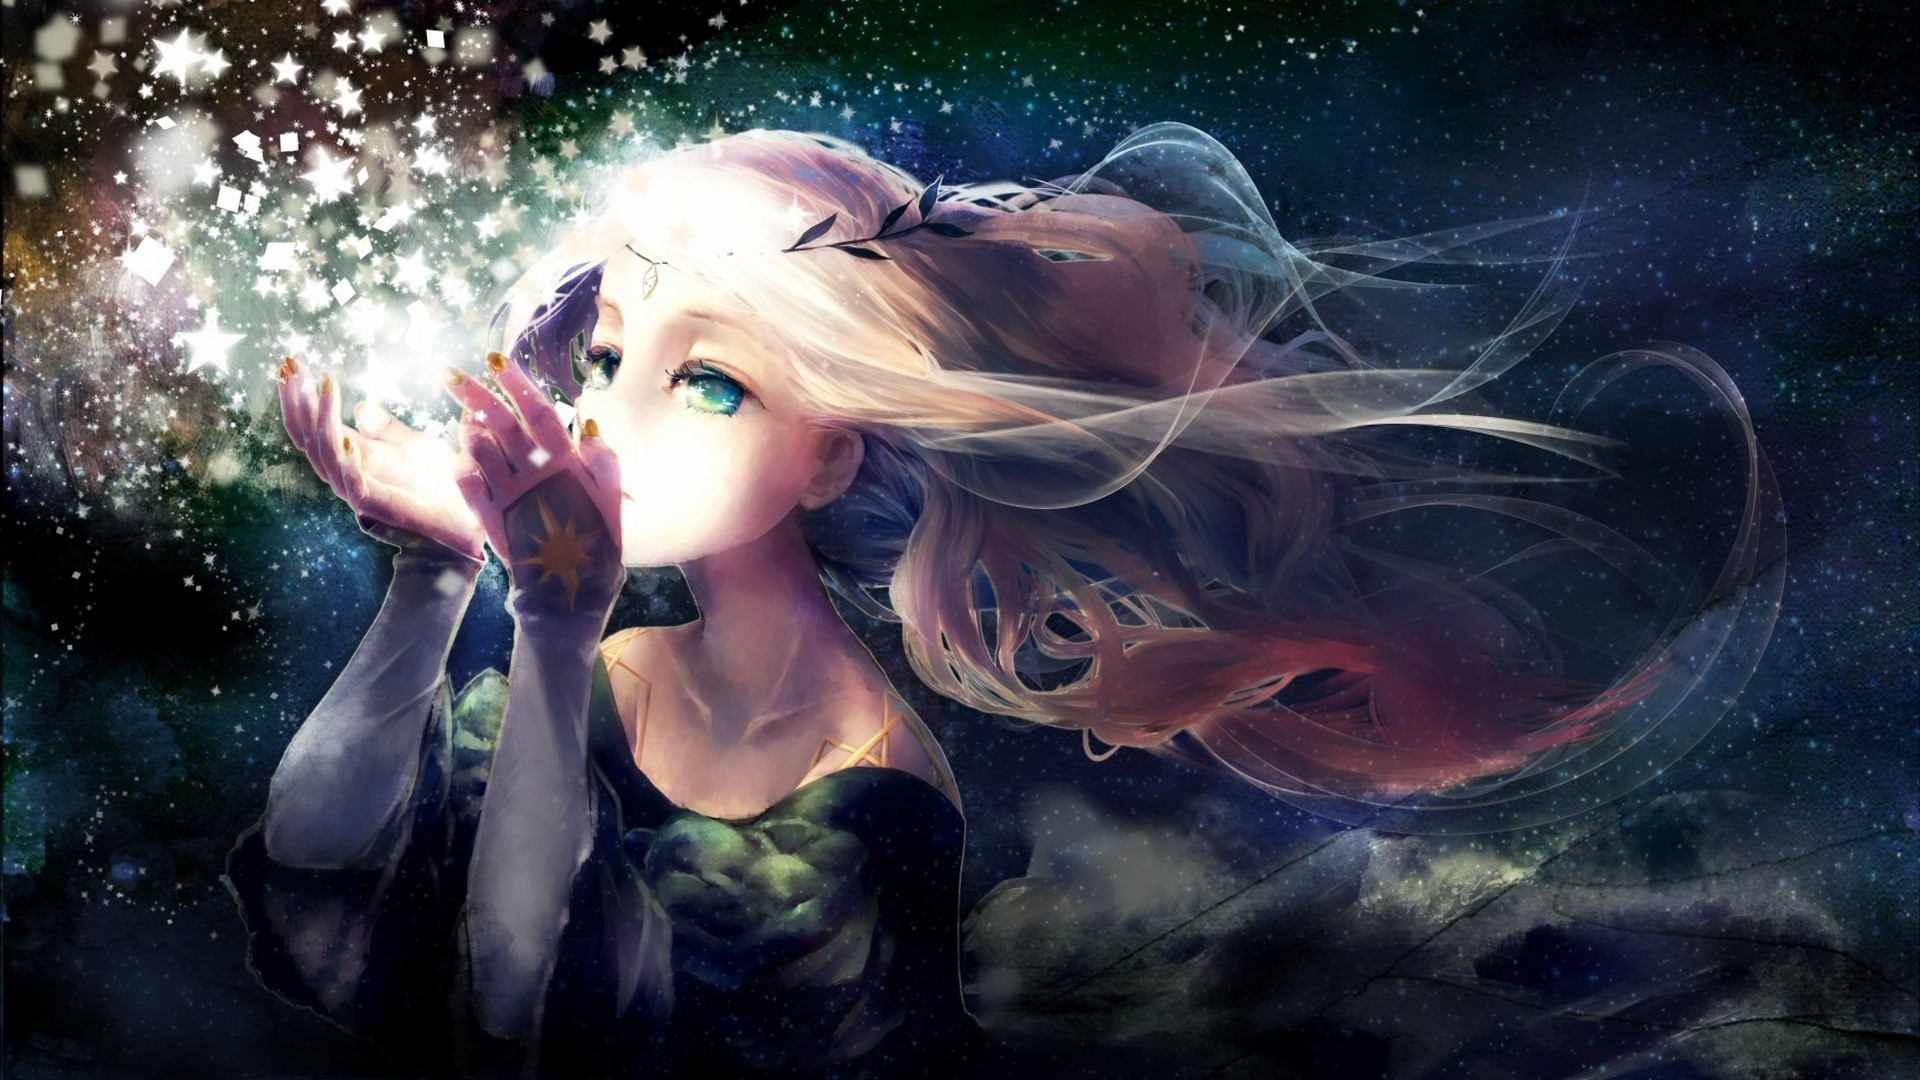 Wallpaper yukino neko, girl, anime, star, wreath